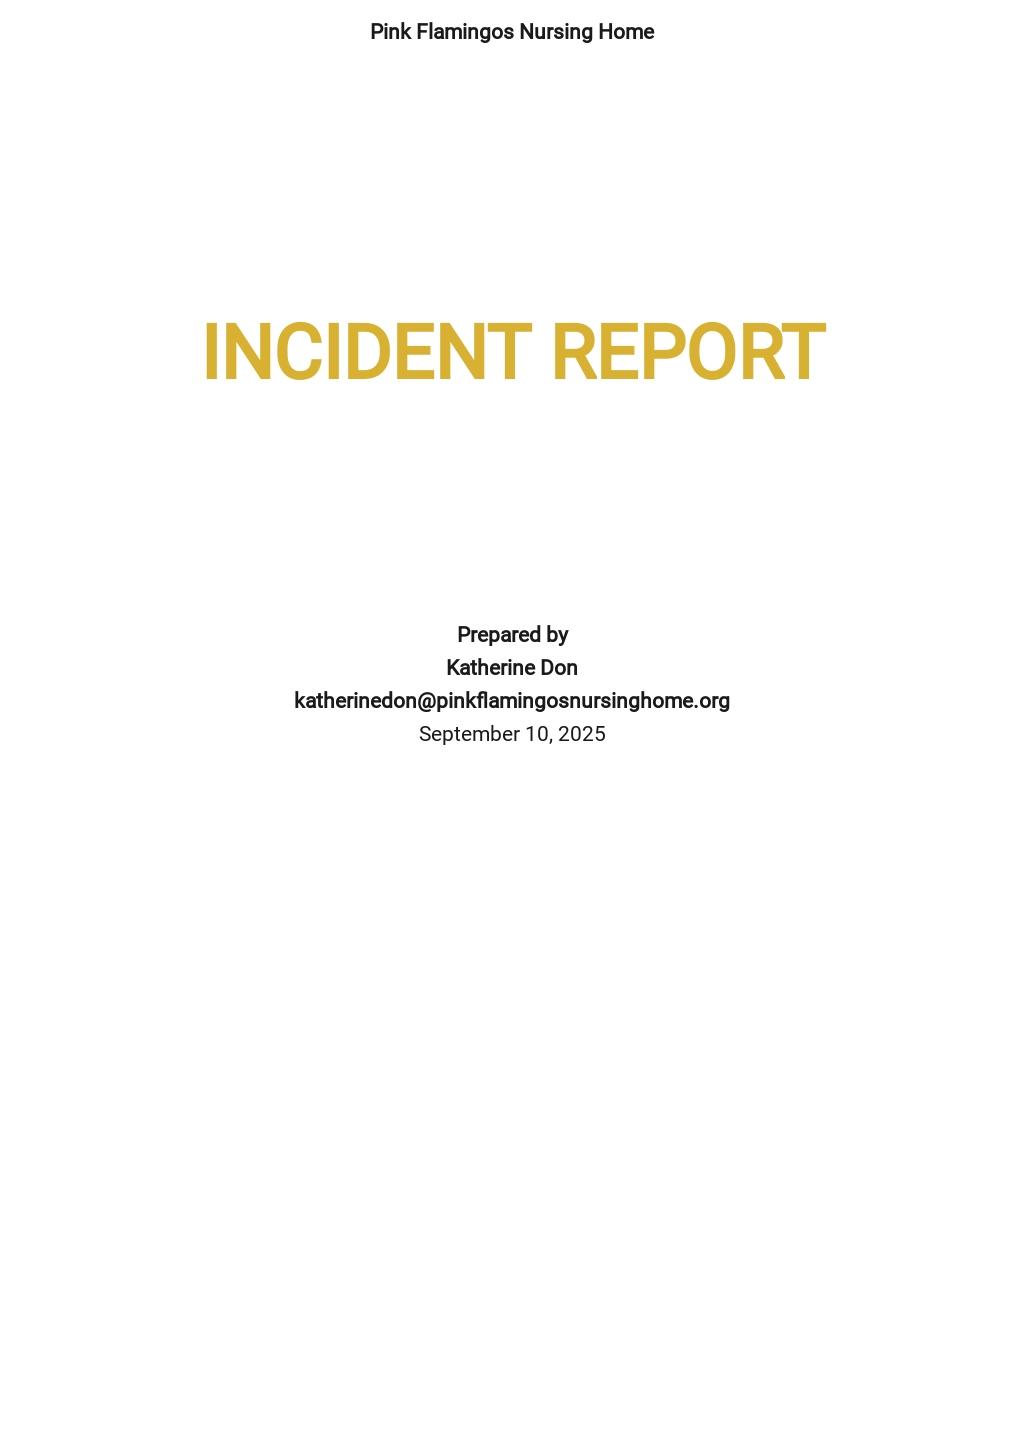 Free Sample Incident Report Template.jpe